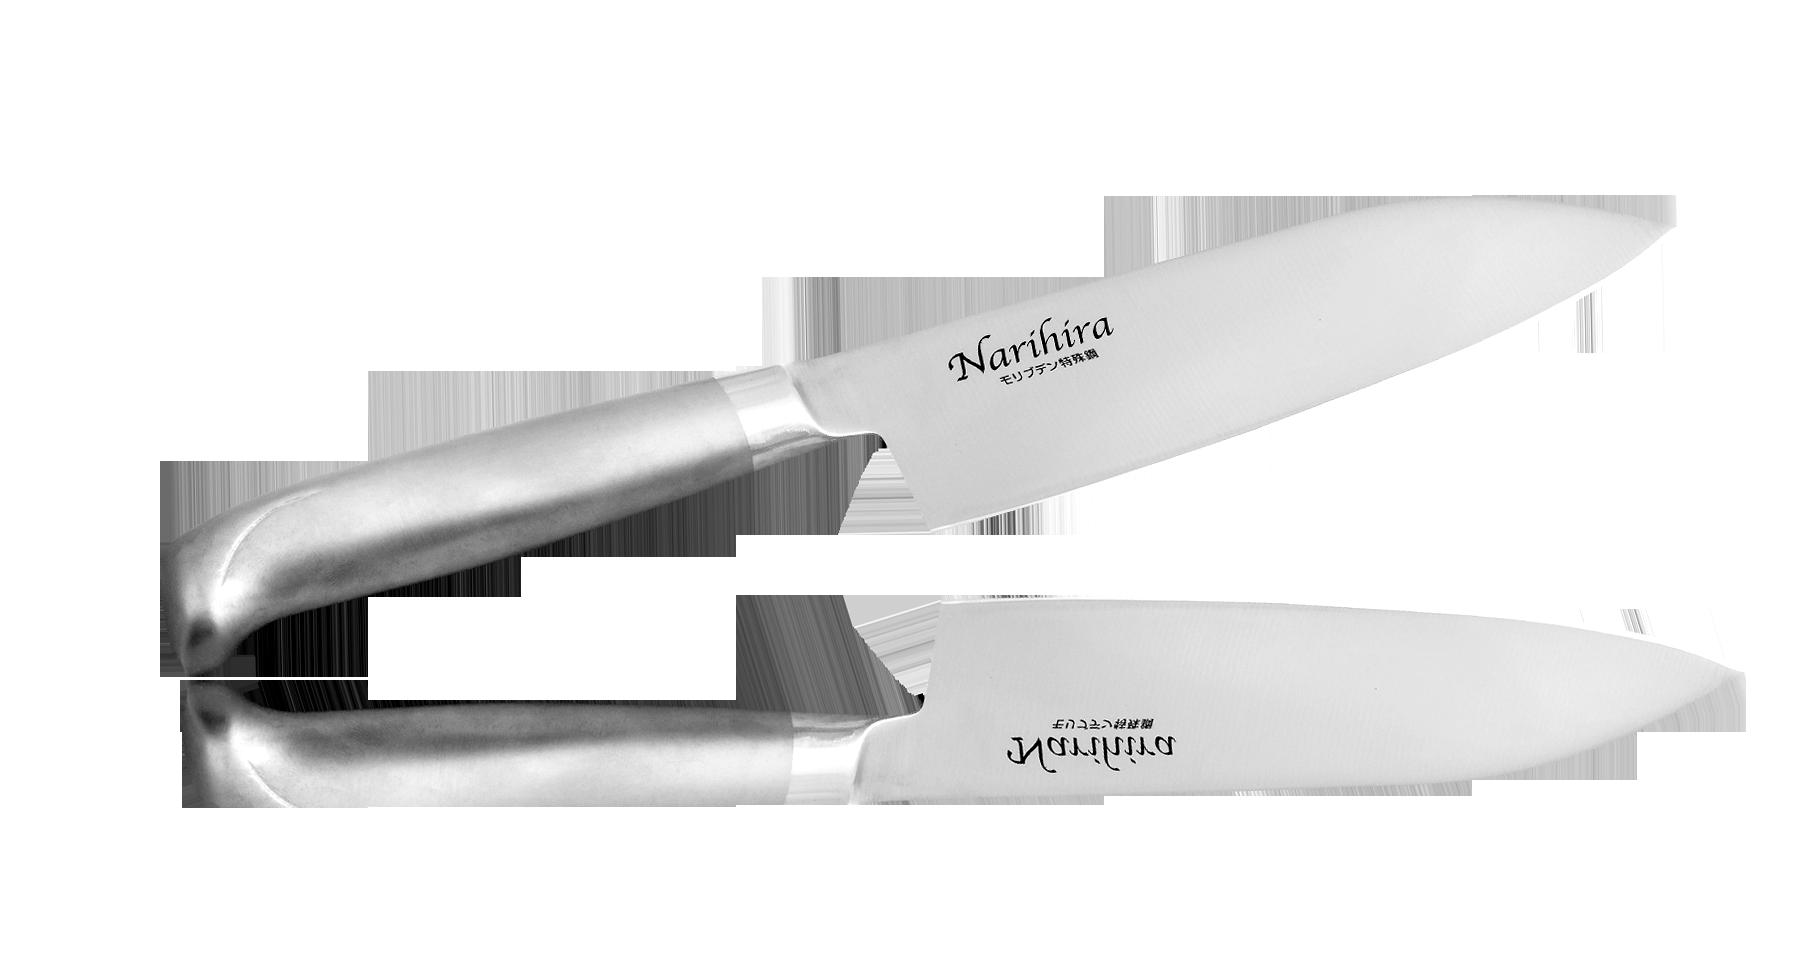 Нож Сантоку Narihira Fuji Cutlery, FC-61, сталь Mo-V, серый нож сантоку narihira fuji cutlery fc 62 сталь mo v серый